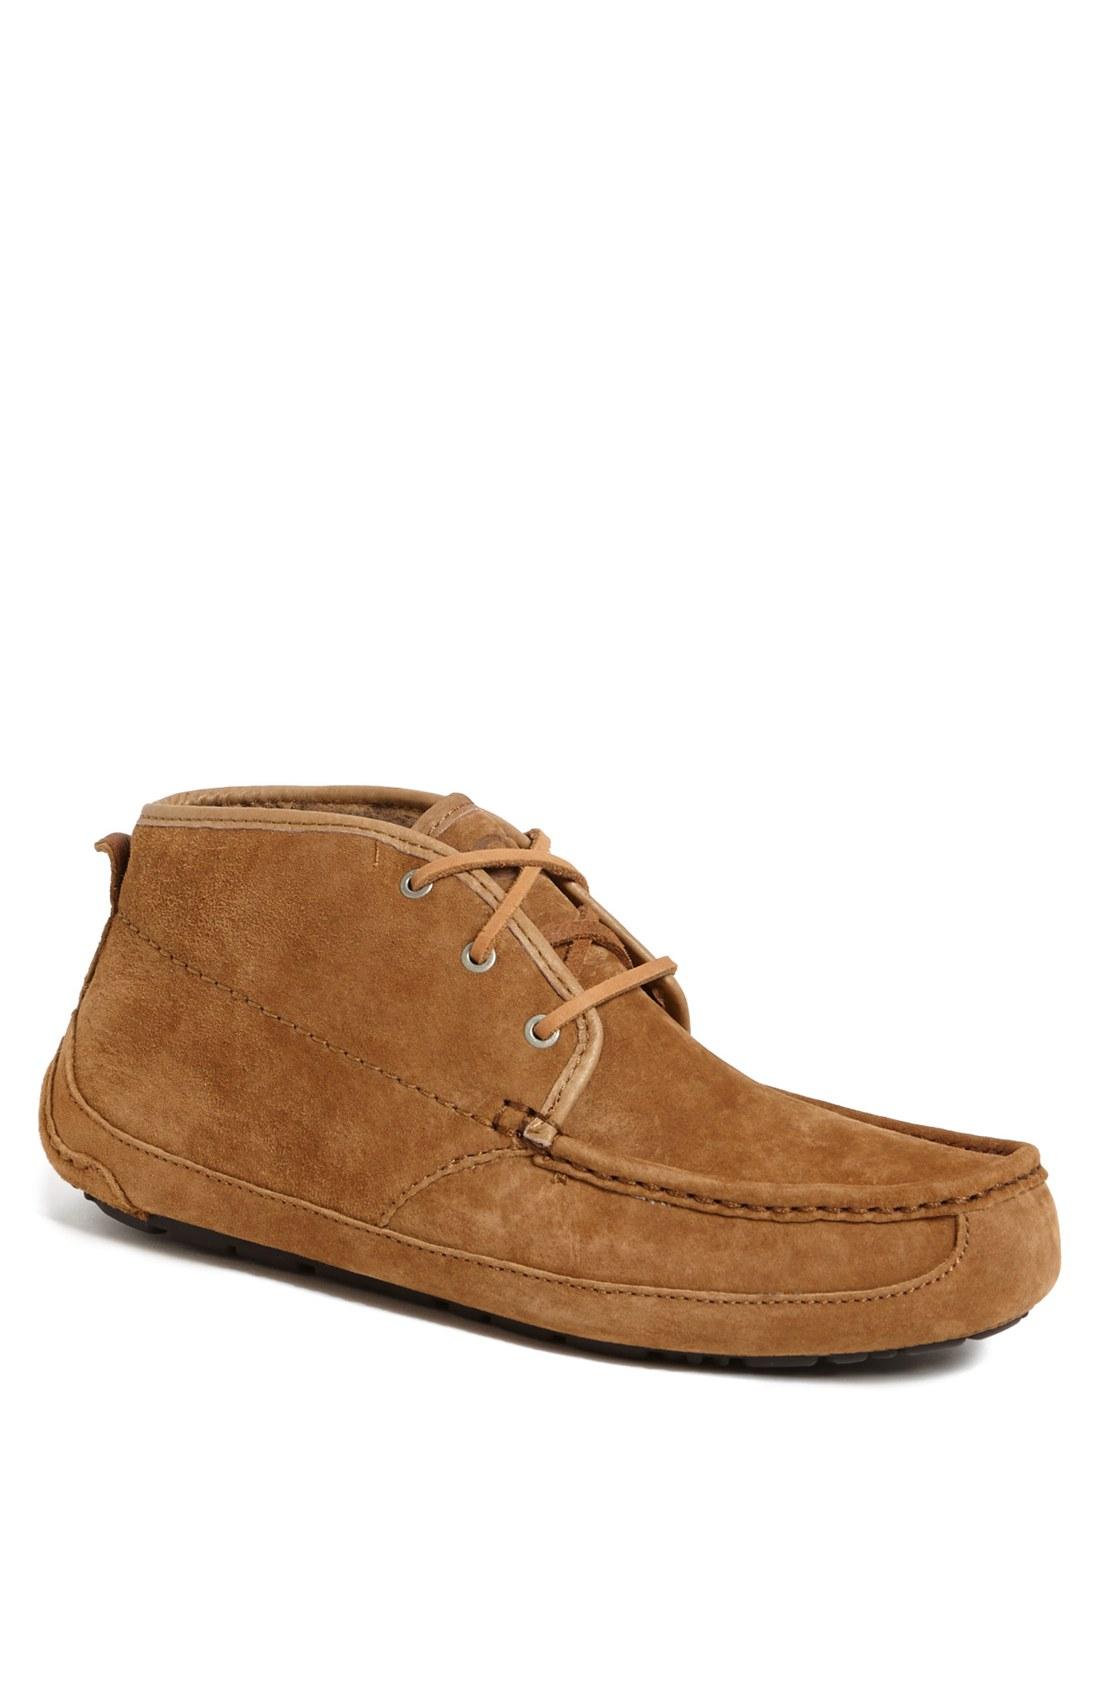 ugg lyle chukka boot slipper in brown for chestnut